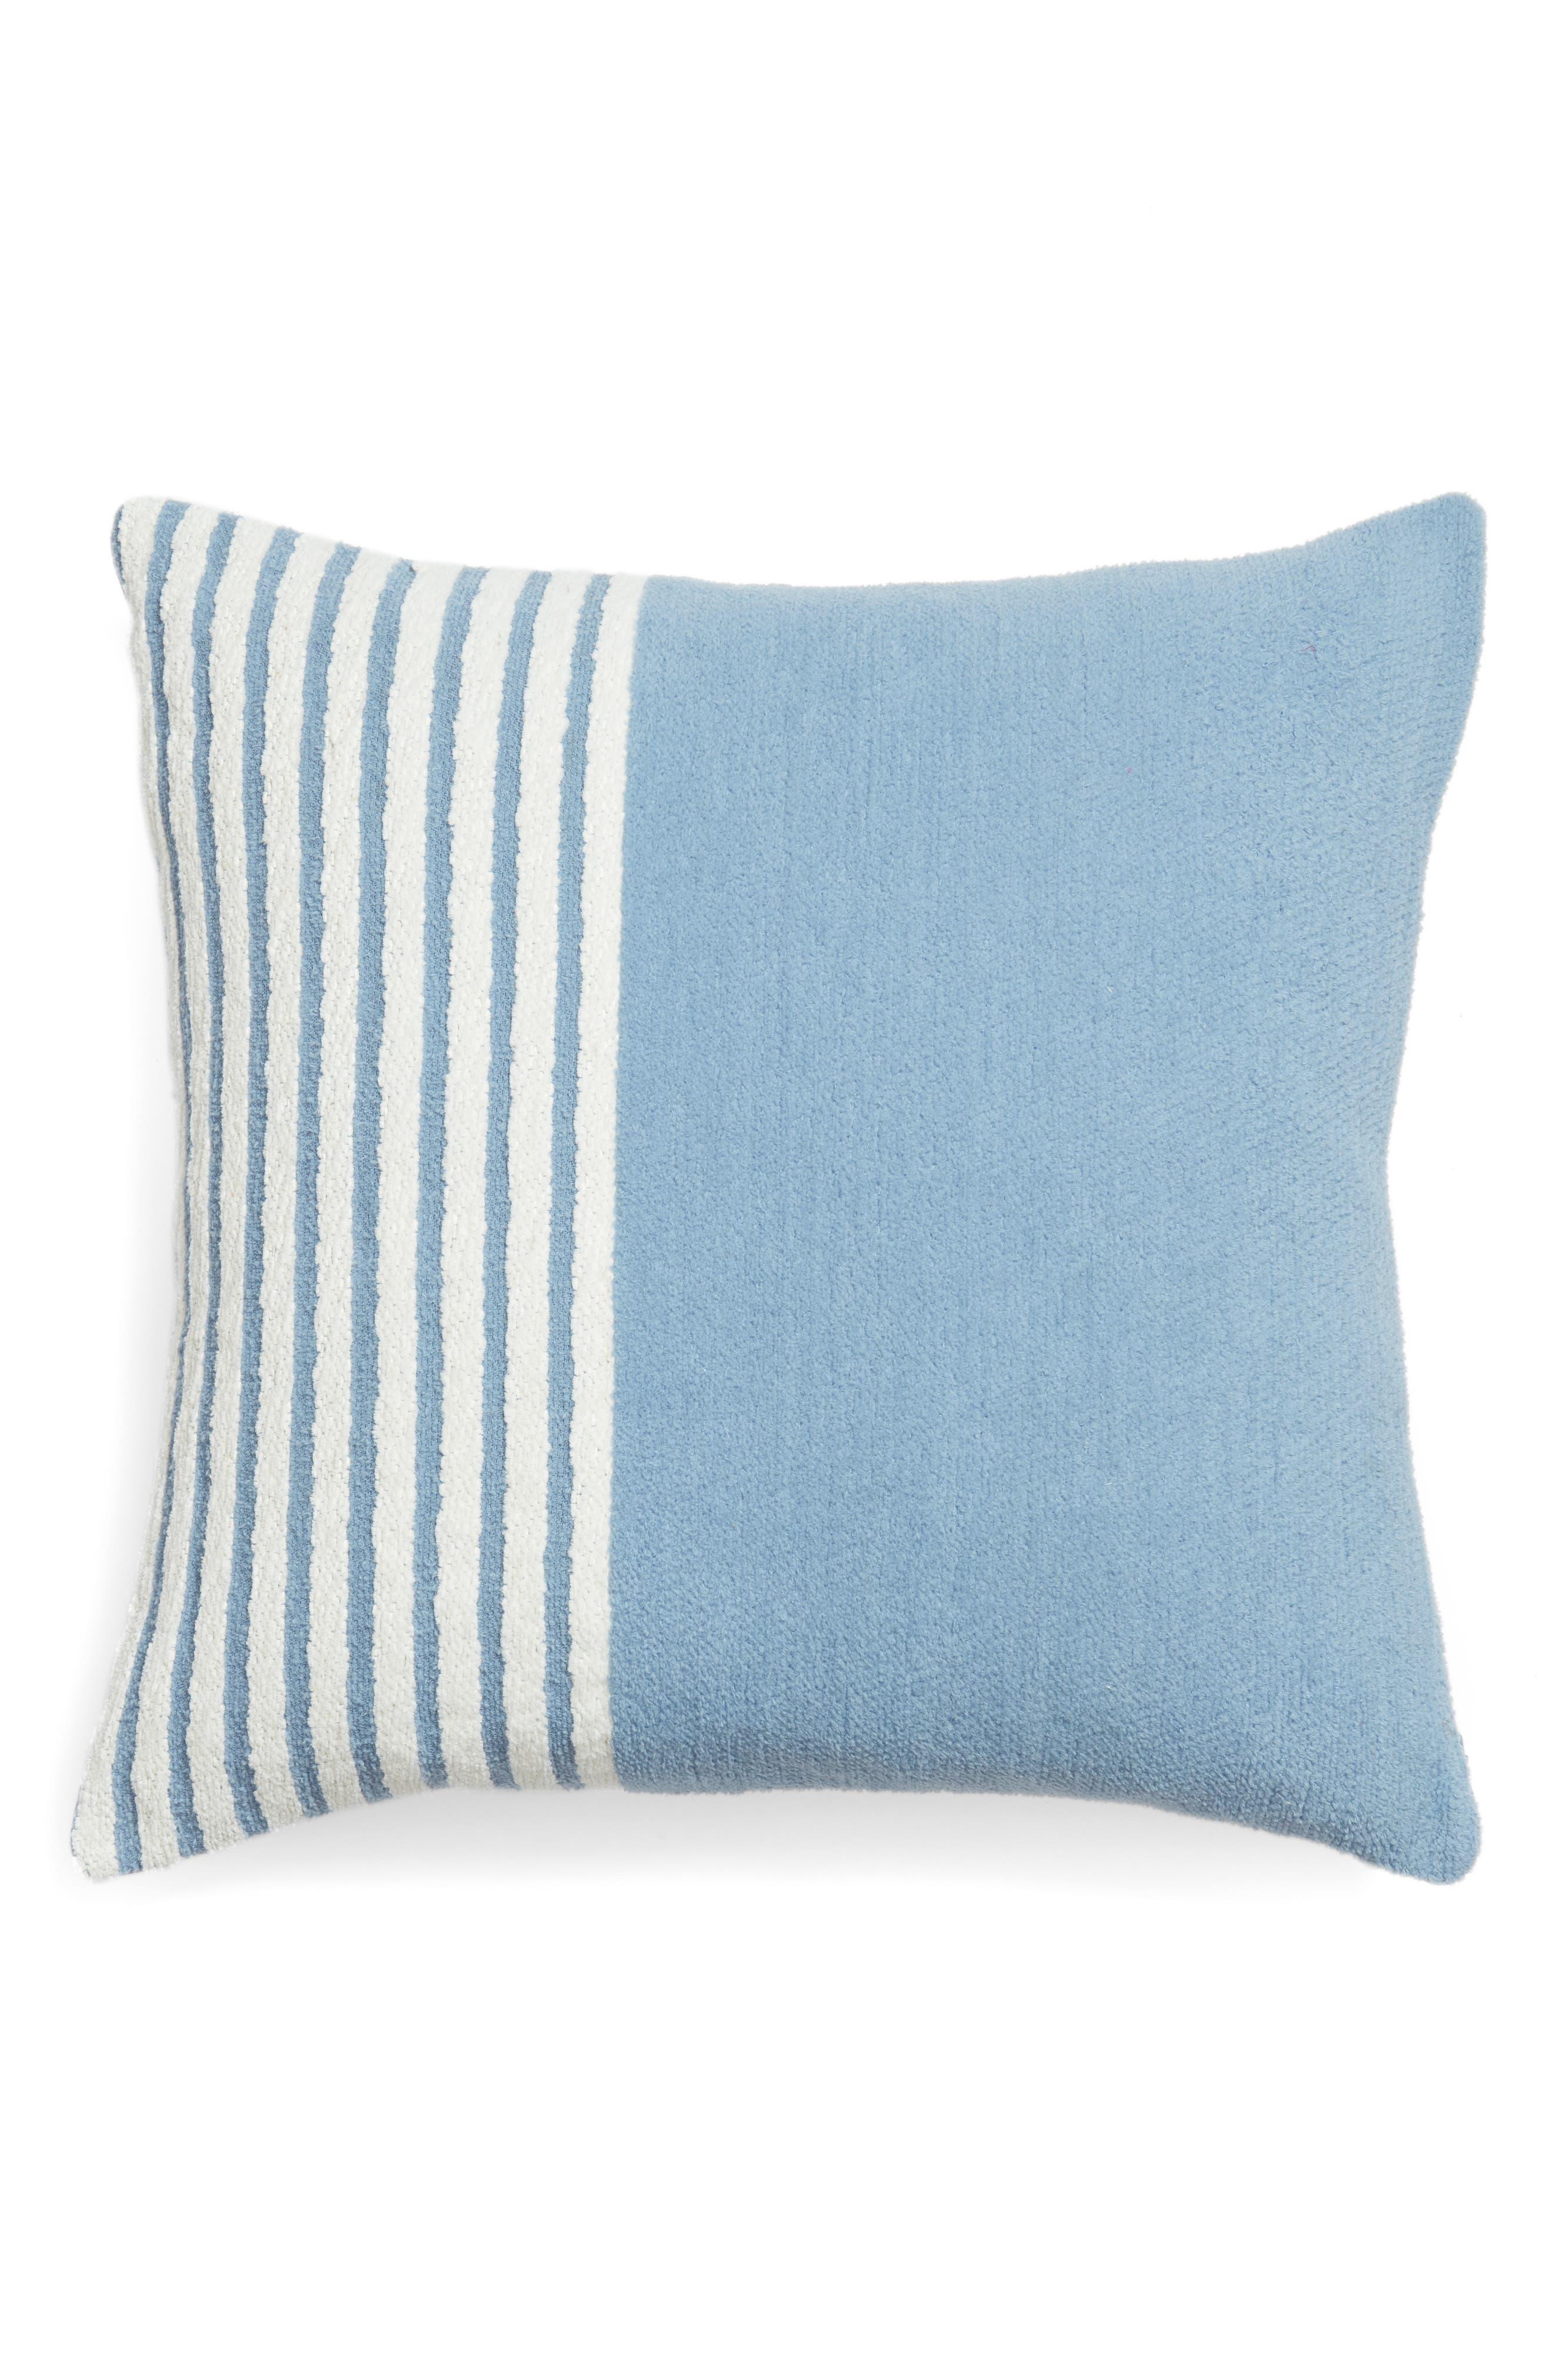 Hammam Stripe Accent Pillow,                             Main thumbnail 2, color,